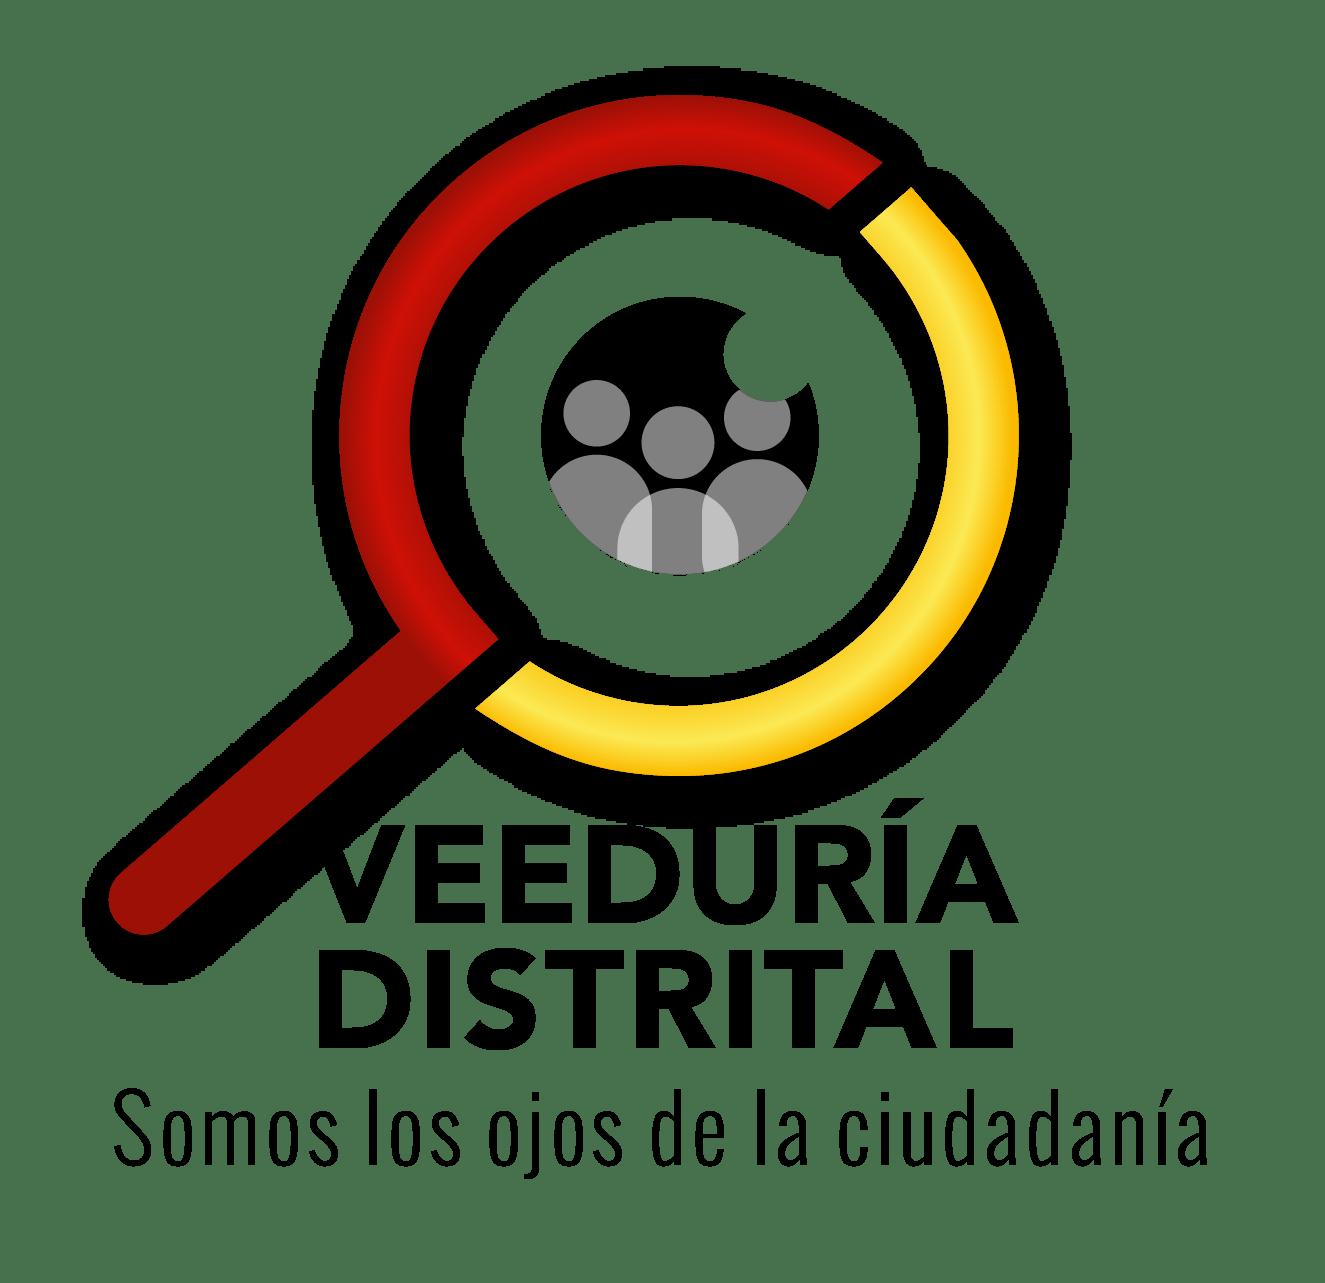 IDPC - Logo Veeduria Distrital 2020